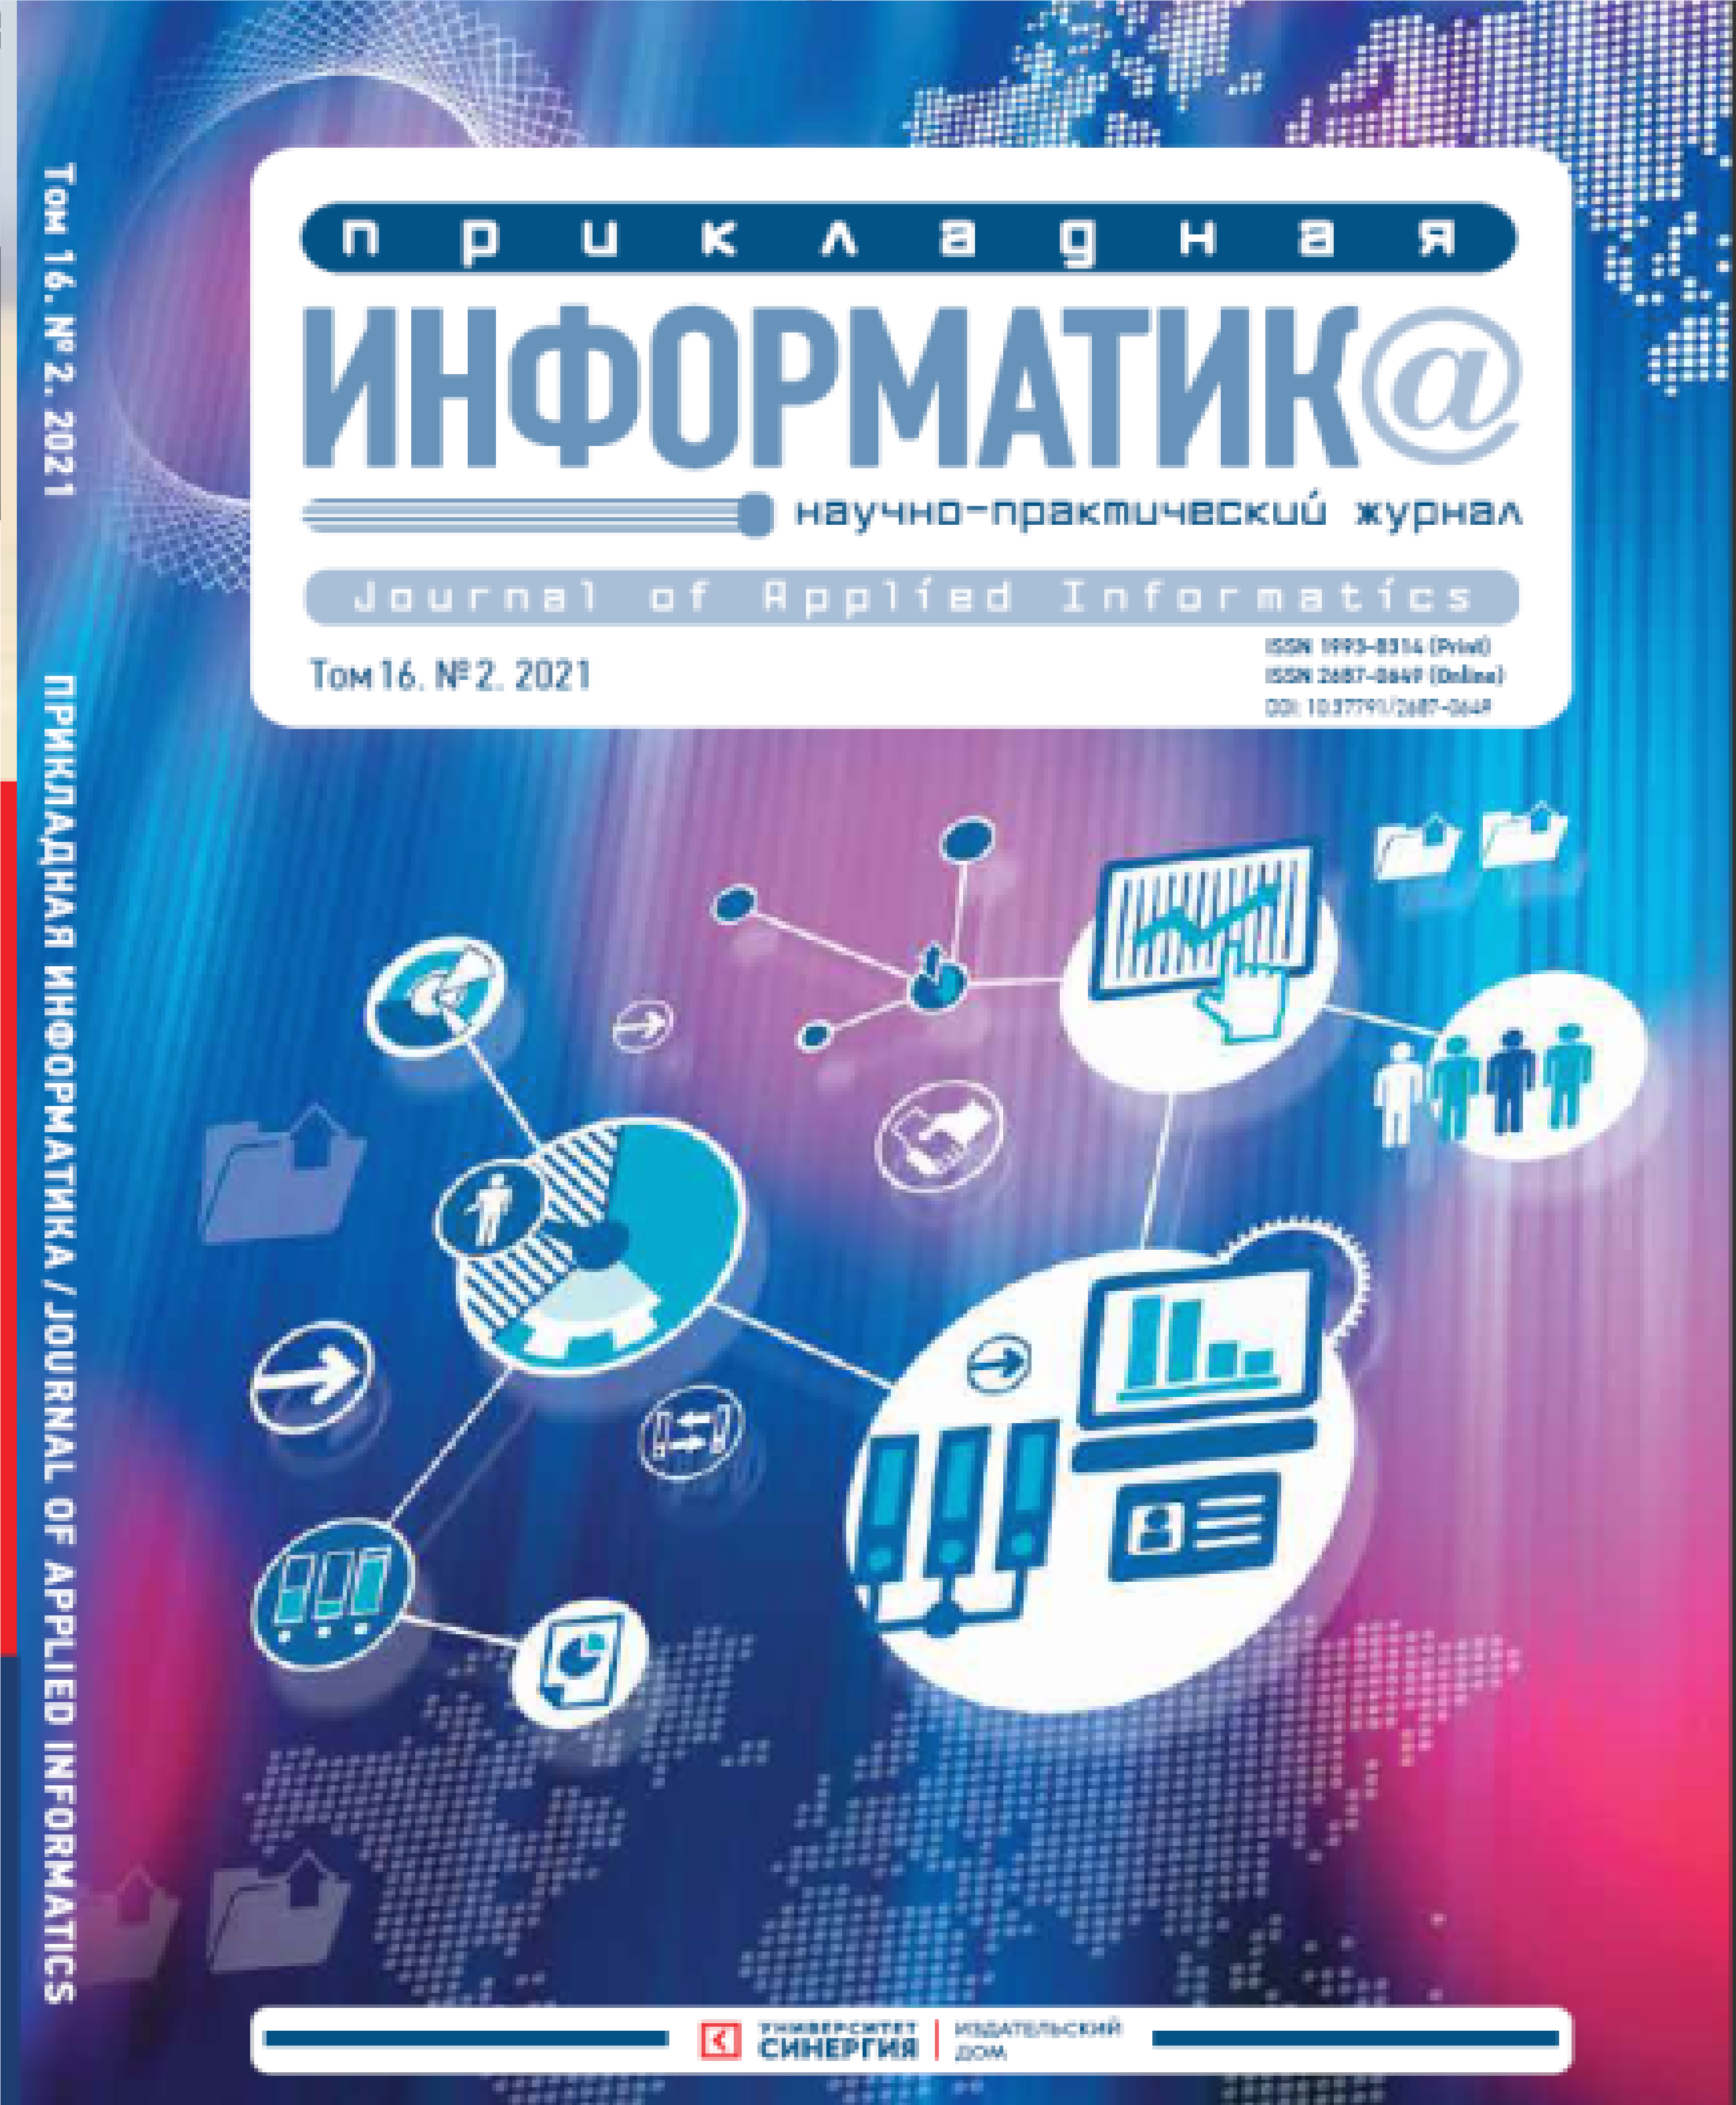 Прикладная информатика ISBN 1993-8314